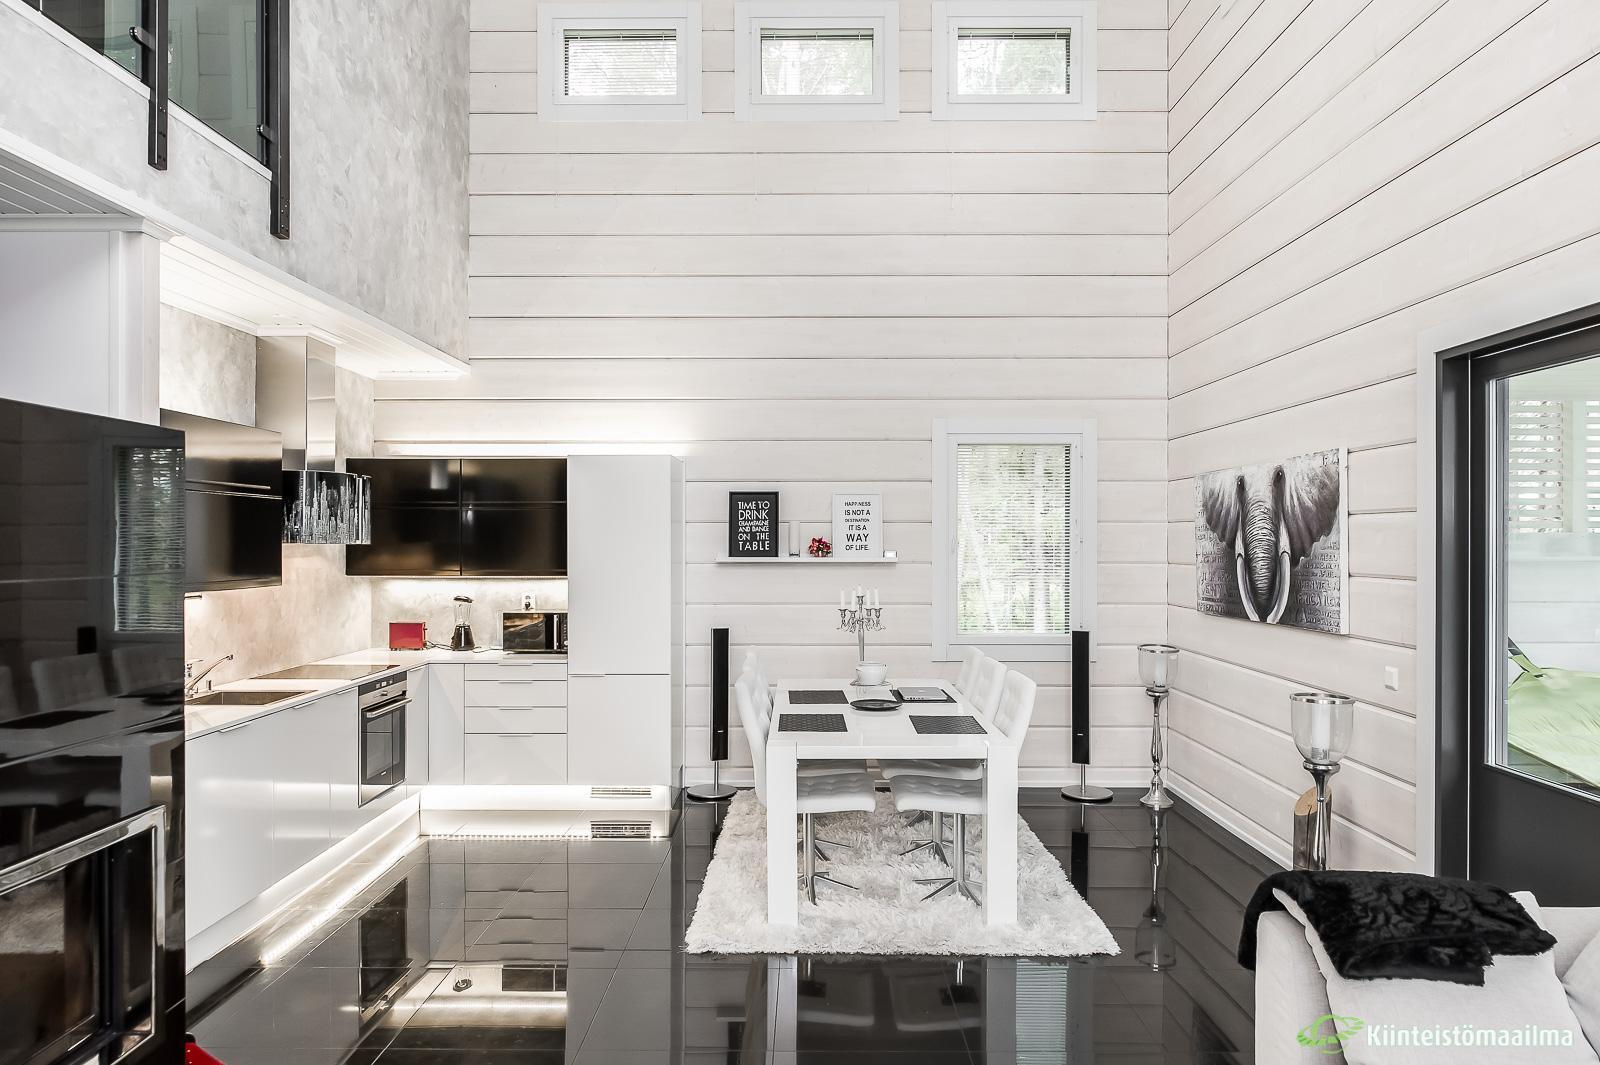 Moderni keittiö 1161812  Etuovi com Ideat & vinkit